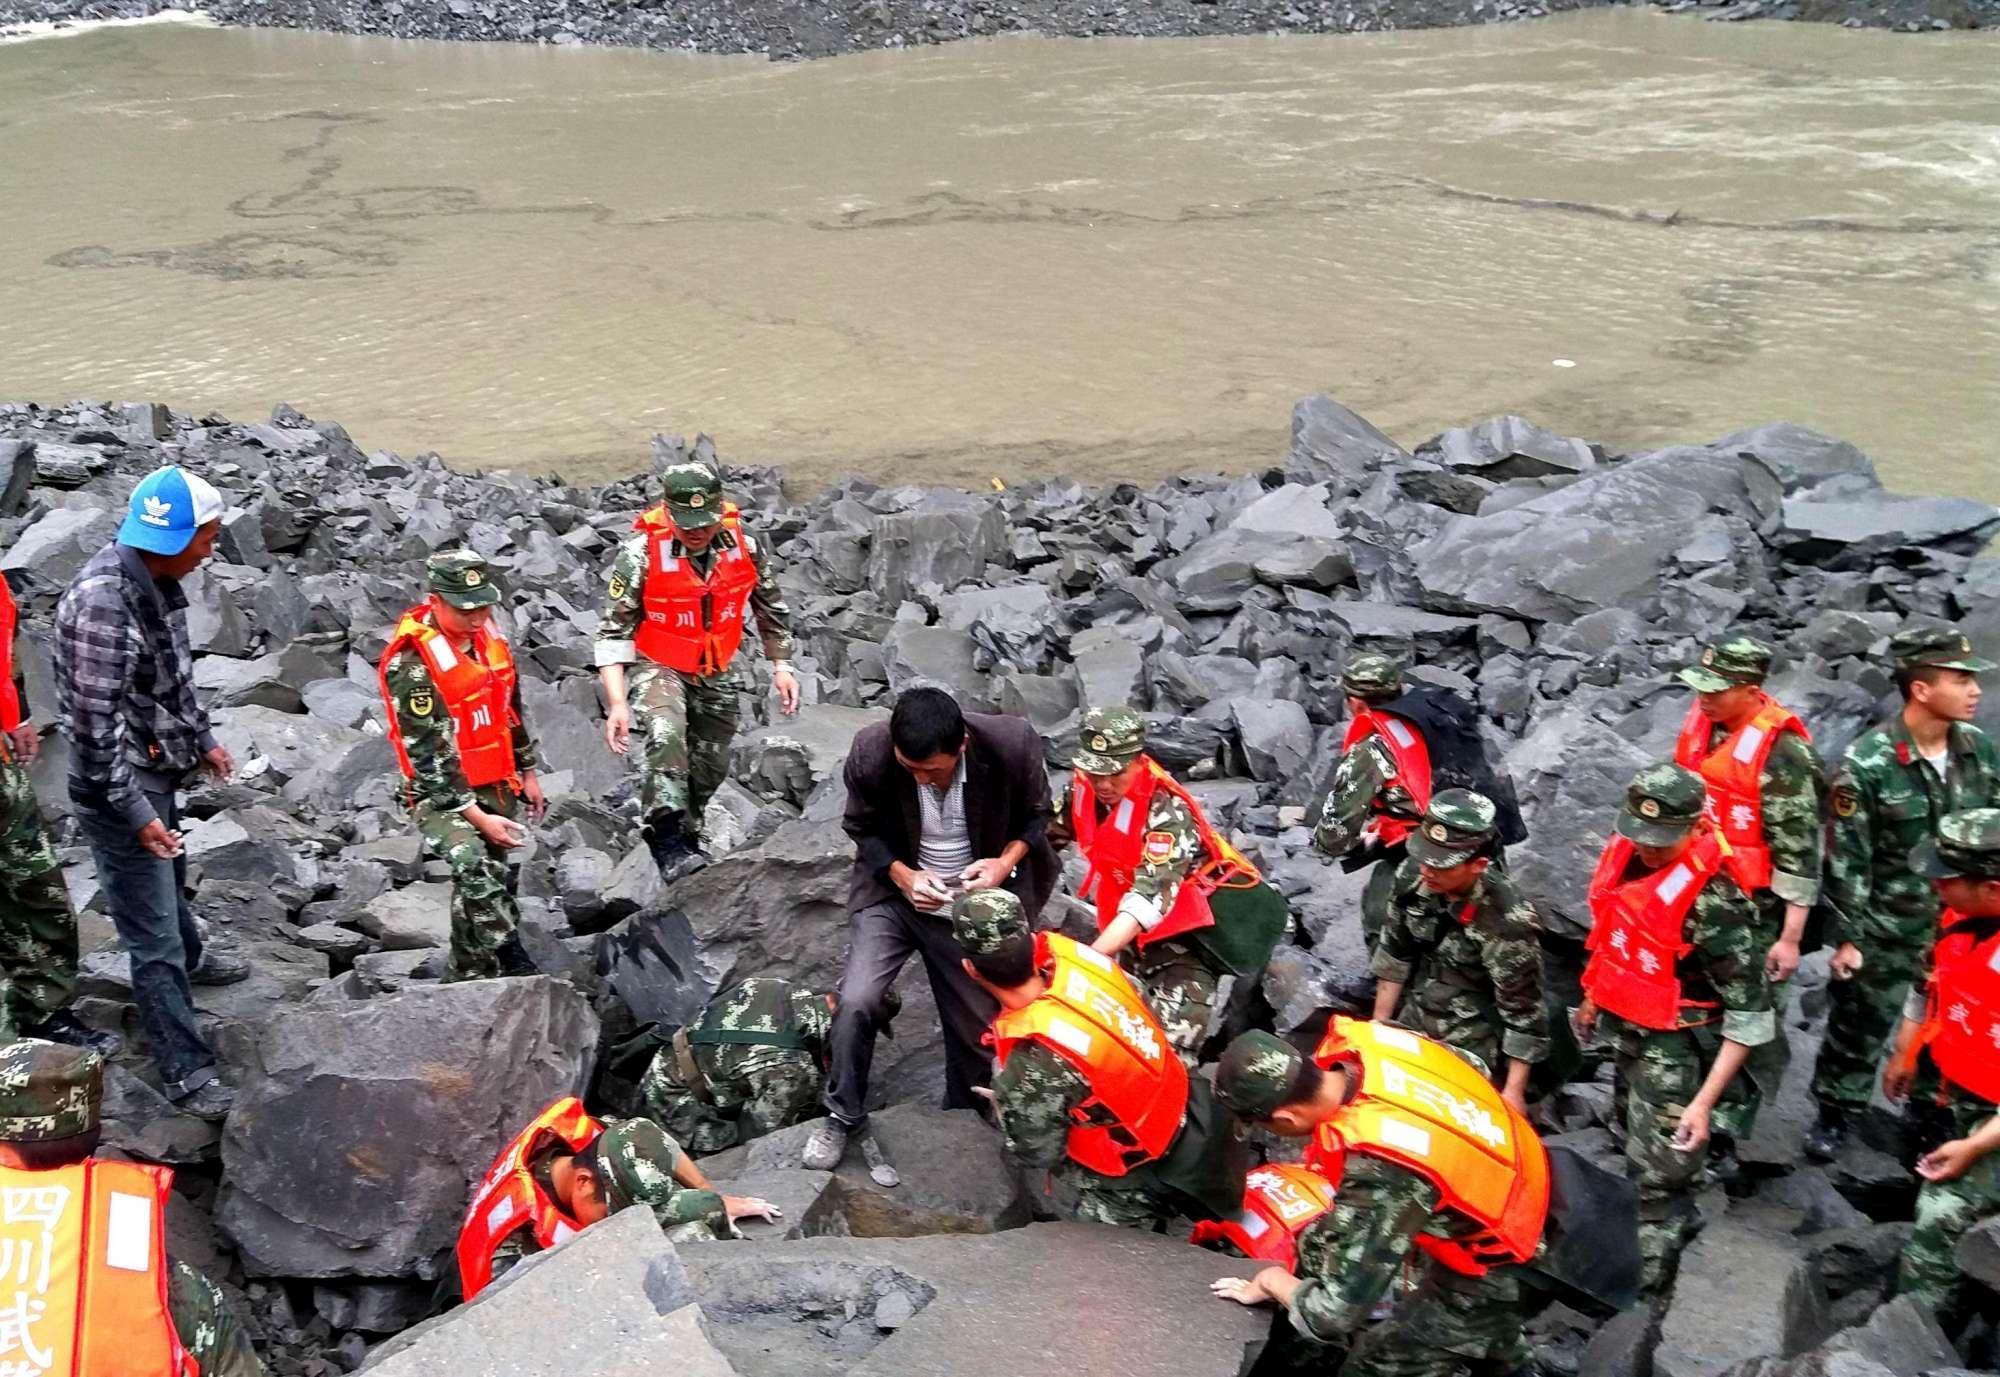 Ultima ora. Frana in paese: 140 persone sepolte vive